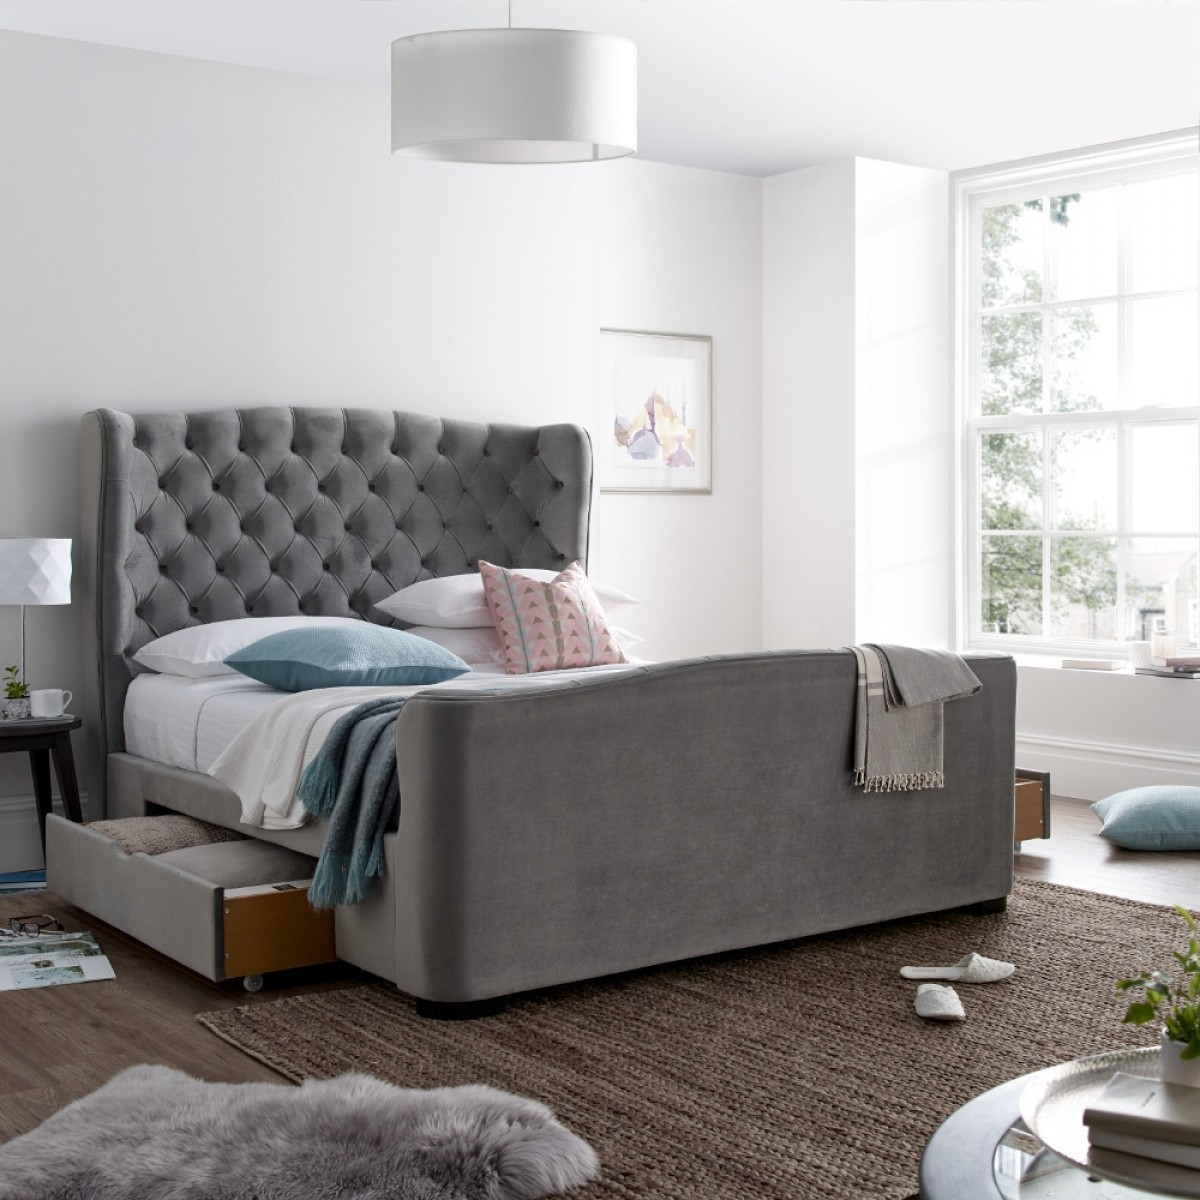 Downton Grey Velvet Fabric 2 Drawer Storage Bed